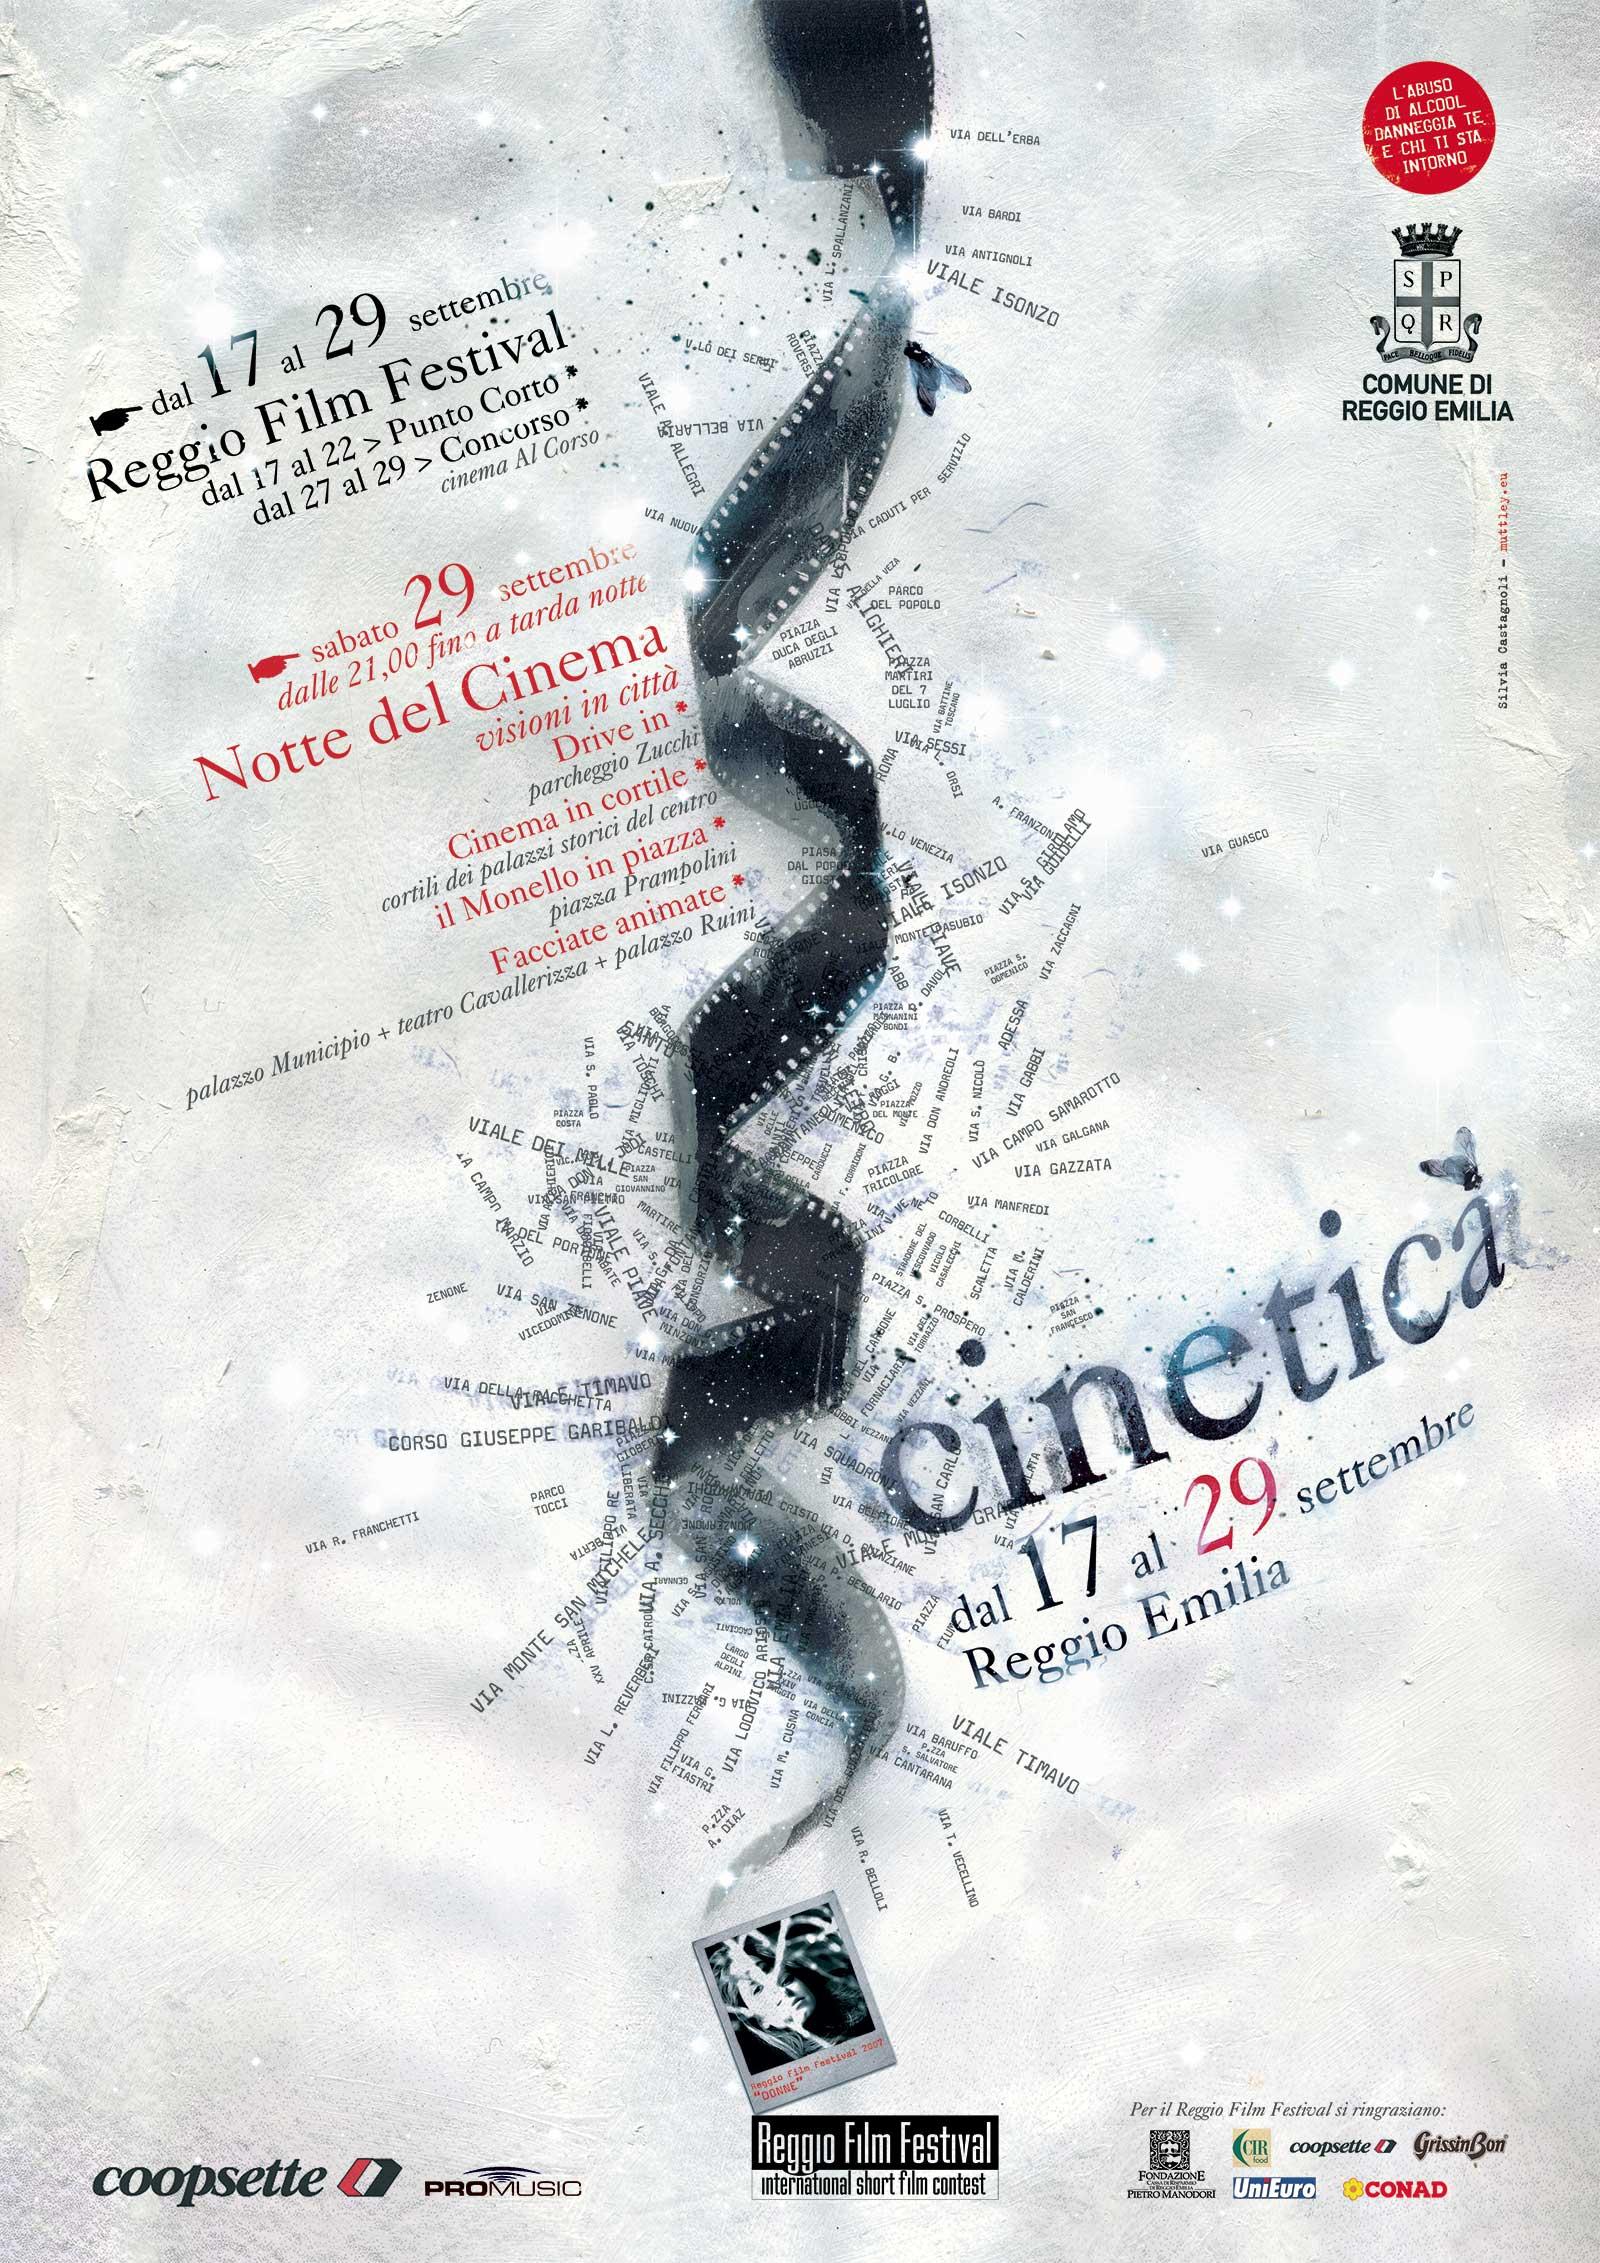 NOTTE-BIANCA-CINETICA-manifesto